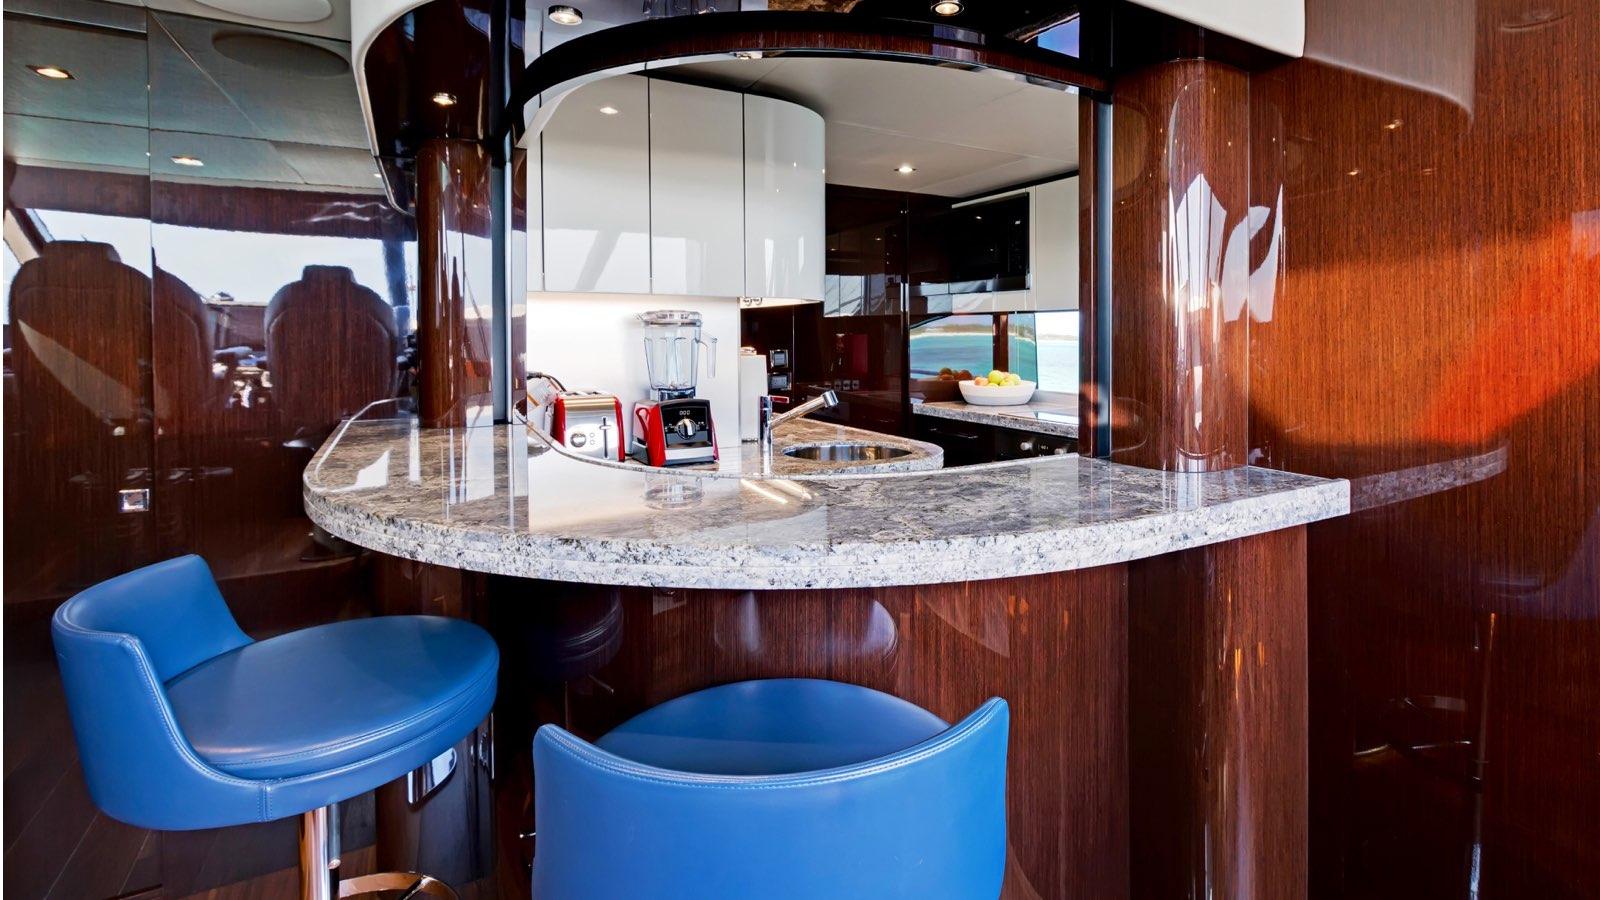 Enterprise_charter_yacht_iyc_interior_breakfast_bar.jpeg